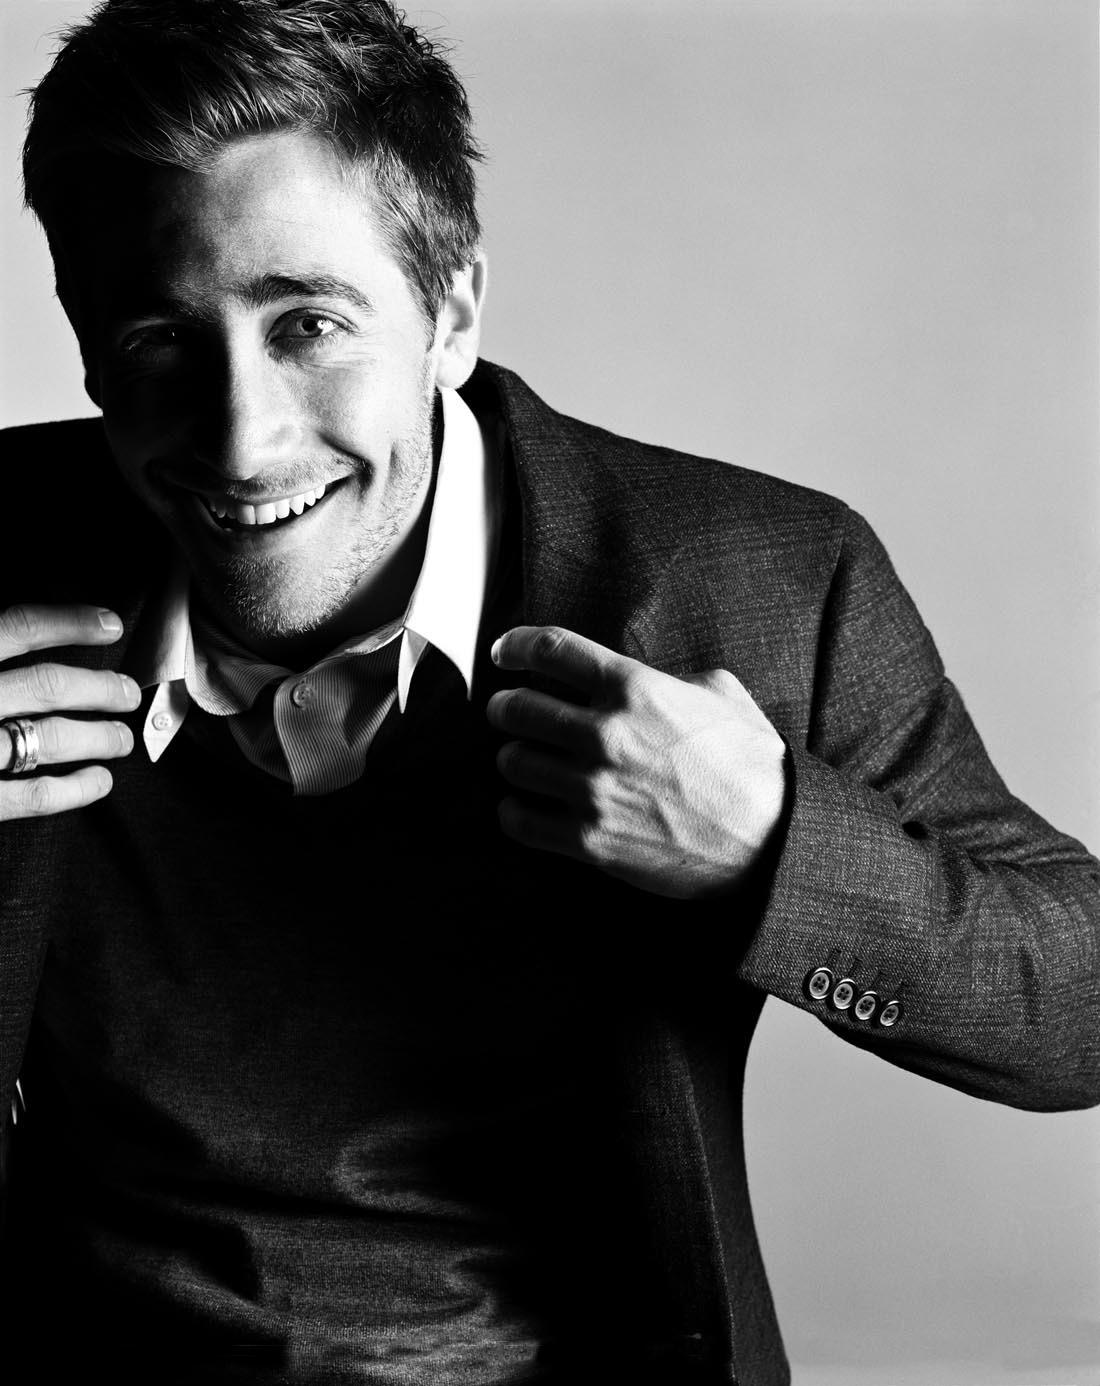 Jake gyllenhaal iphone wallpaper tumblr - Gyllenhaalicious Hundred Days Of Jake Gyllenhaal 43 100